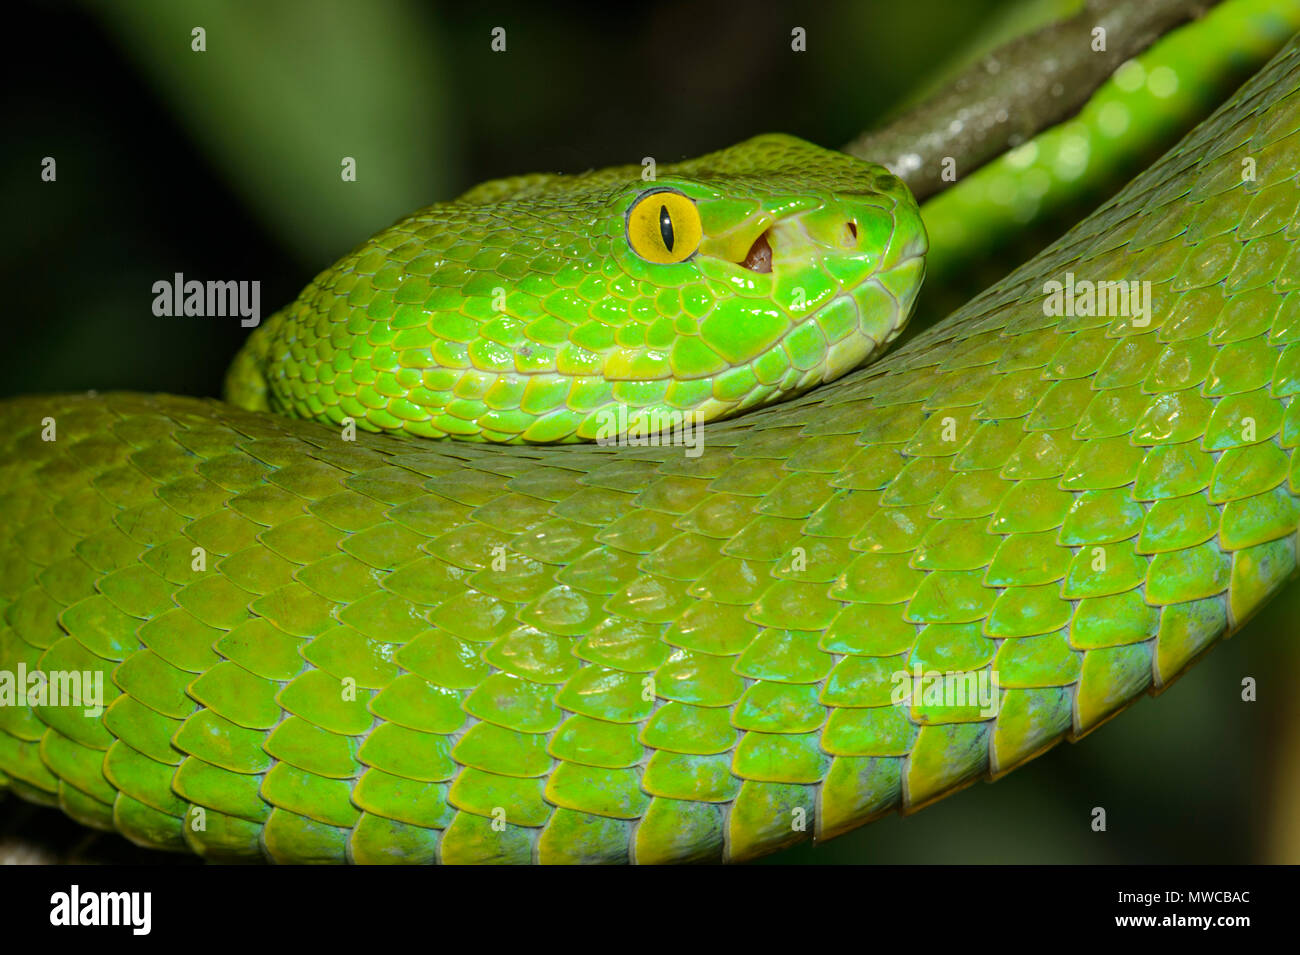 Blanco-labiado (pit viper Trimeresurus albolabris) cautivos. Endémica del Sudeste de Asia, Reptilia zoo de reptiles, Vaughan, Ontario, Canadá Imagen De Stock